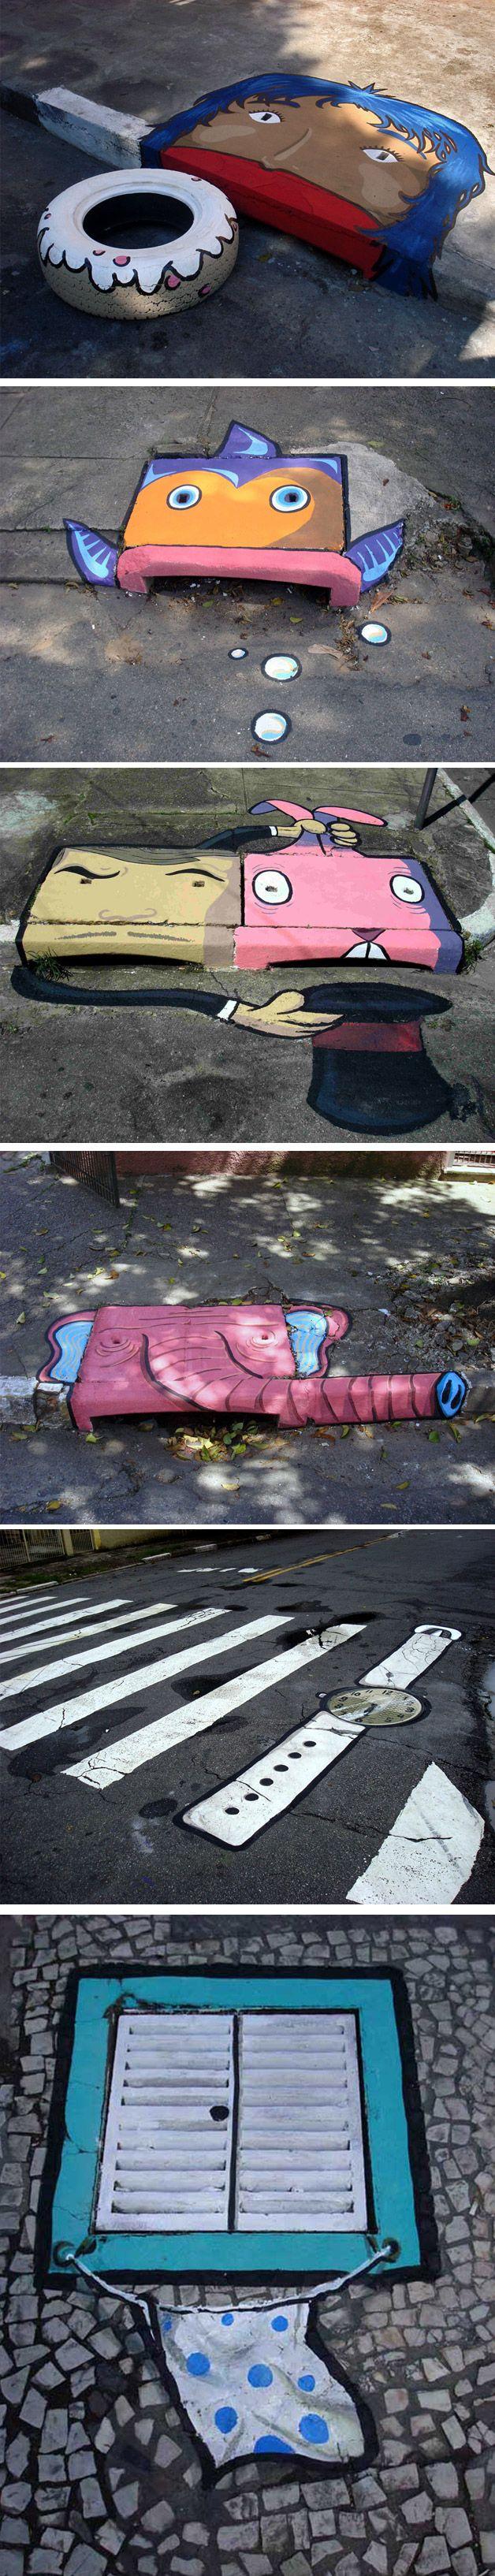 Street art em bueiros de rua... https://www.etsy.com/shop/urbanNYCdesigns?ref=hdr_shop_menu